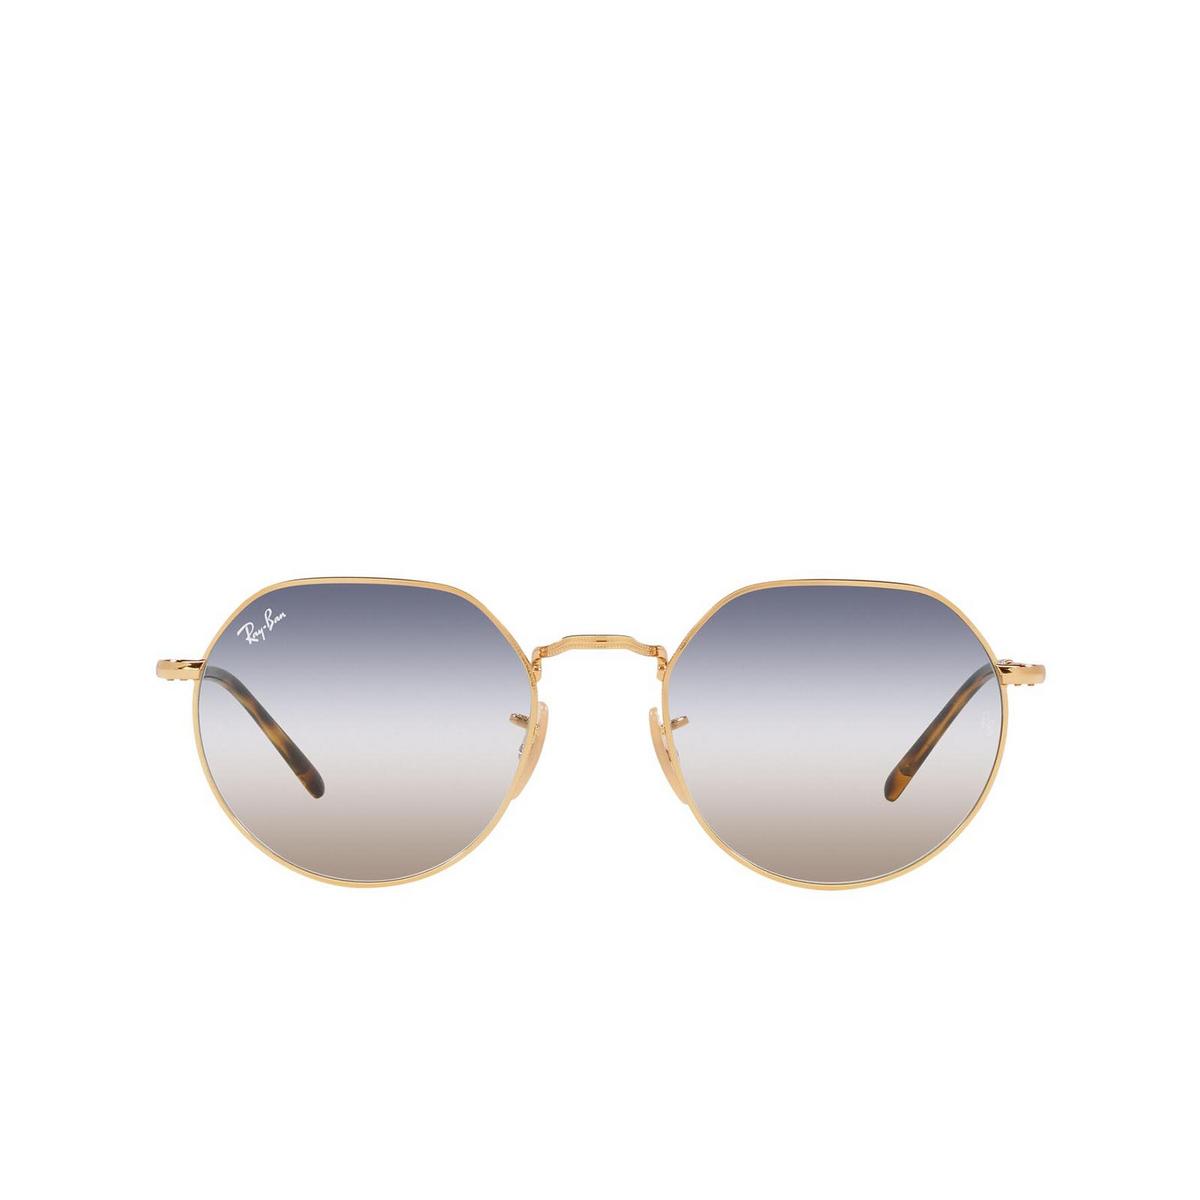 Ray-Ban® Irregular Sunglasses: Jack RB3565 color Arista 001/GD.